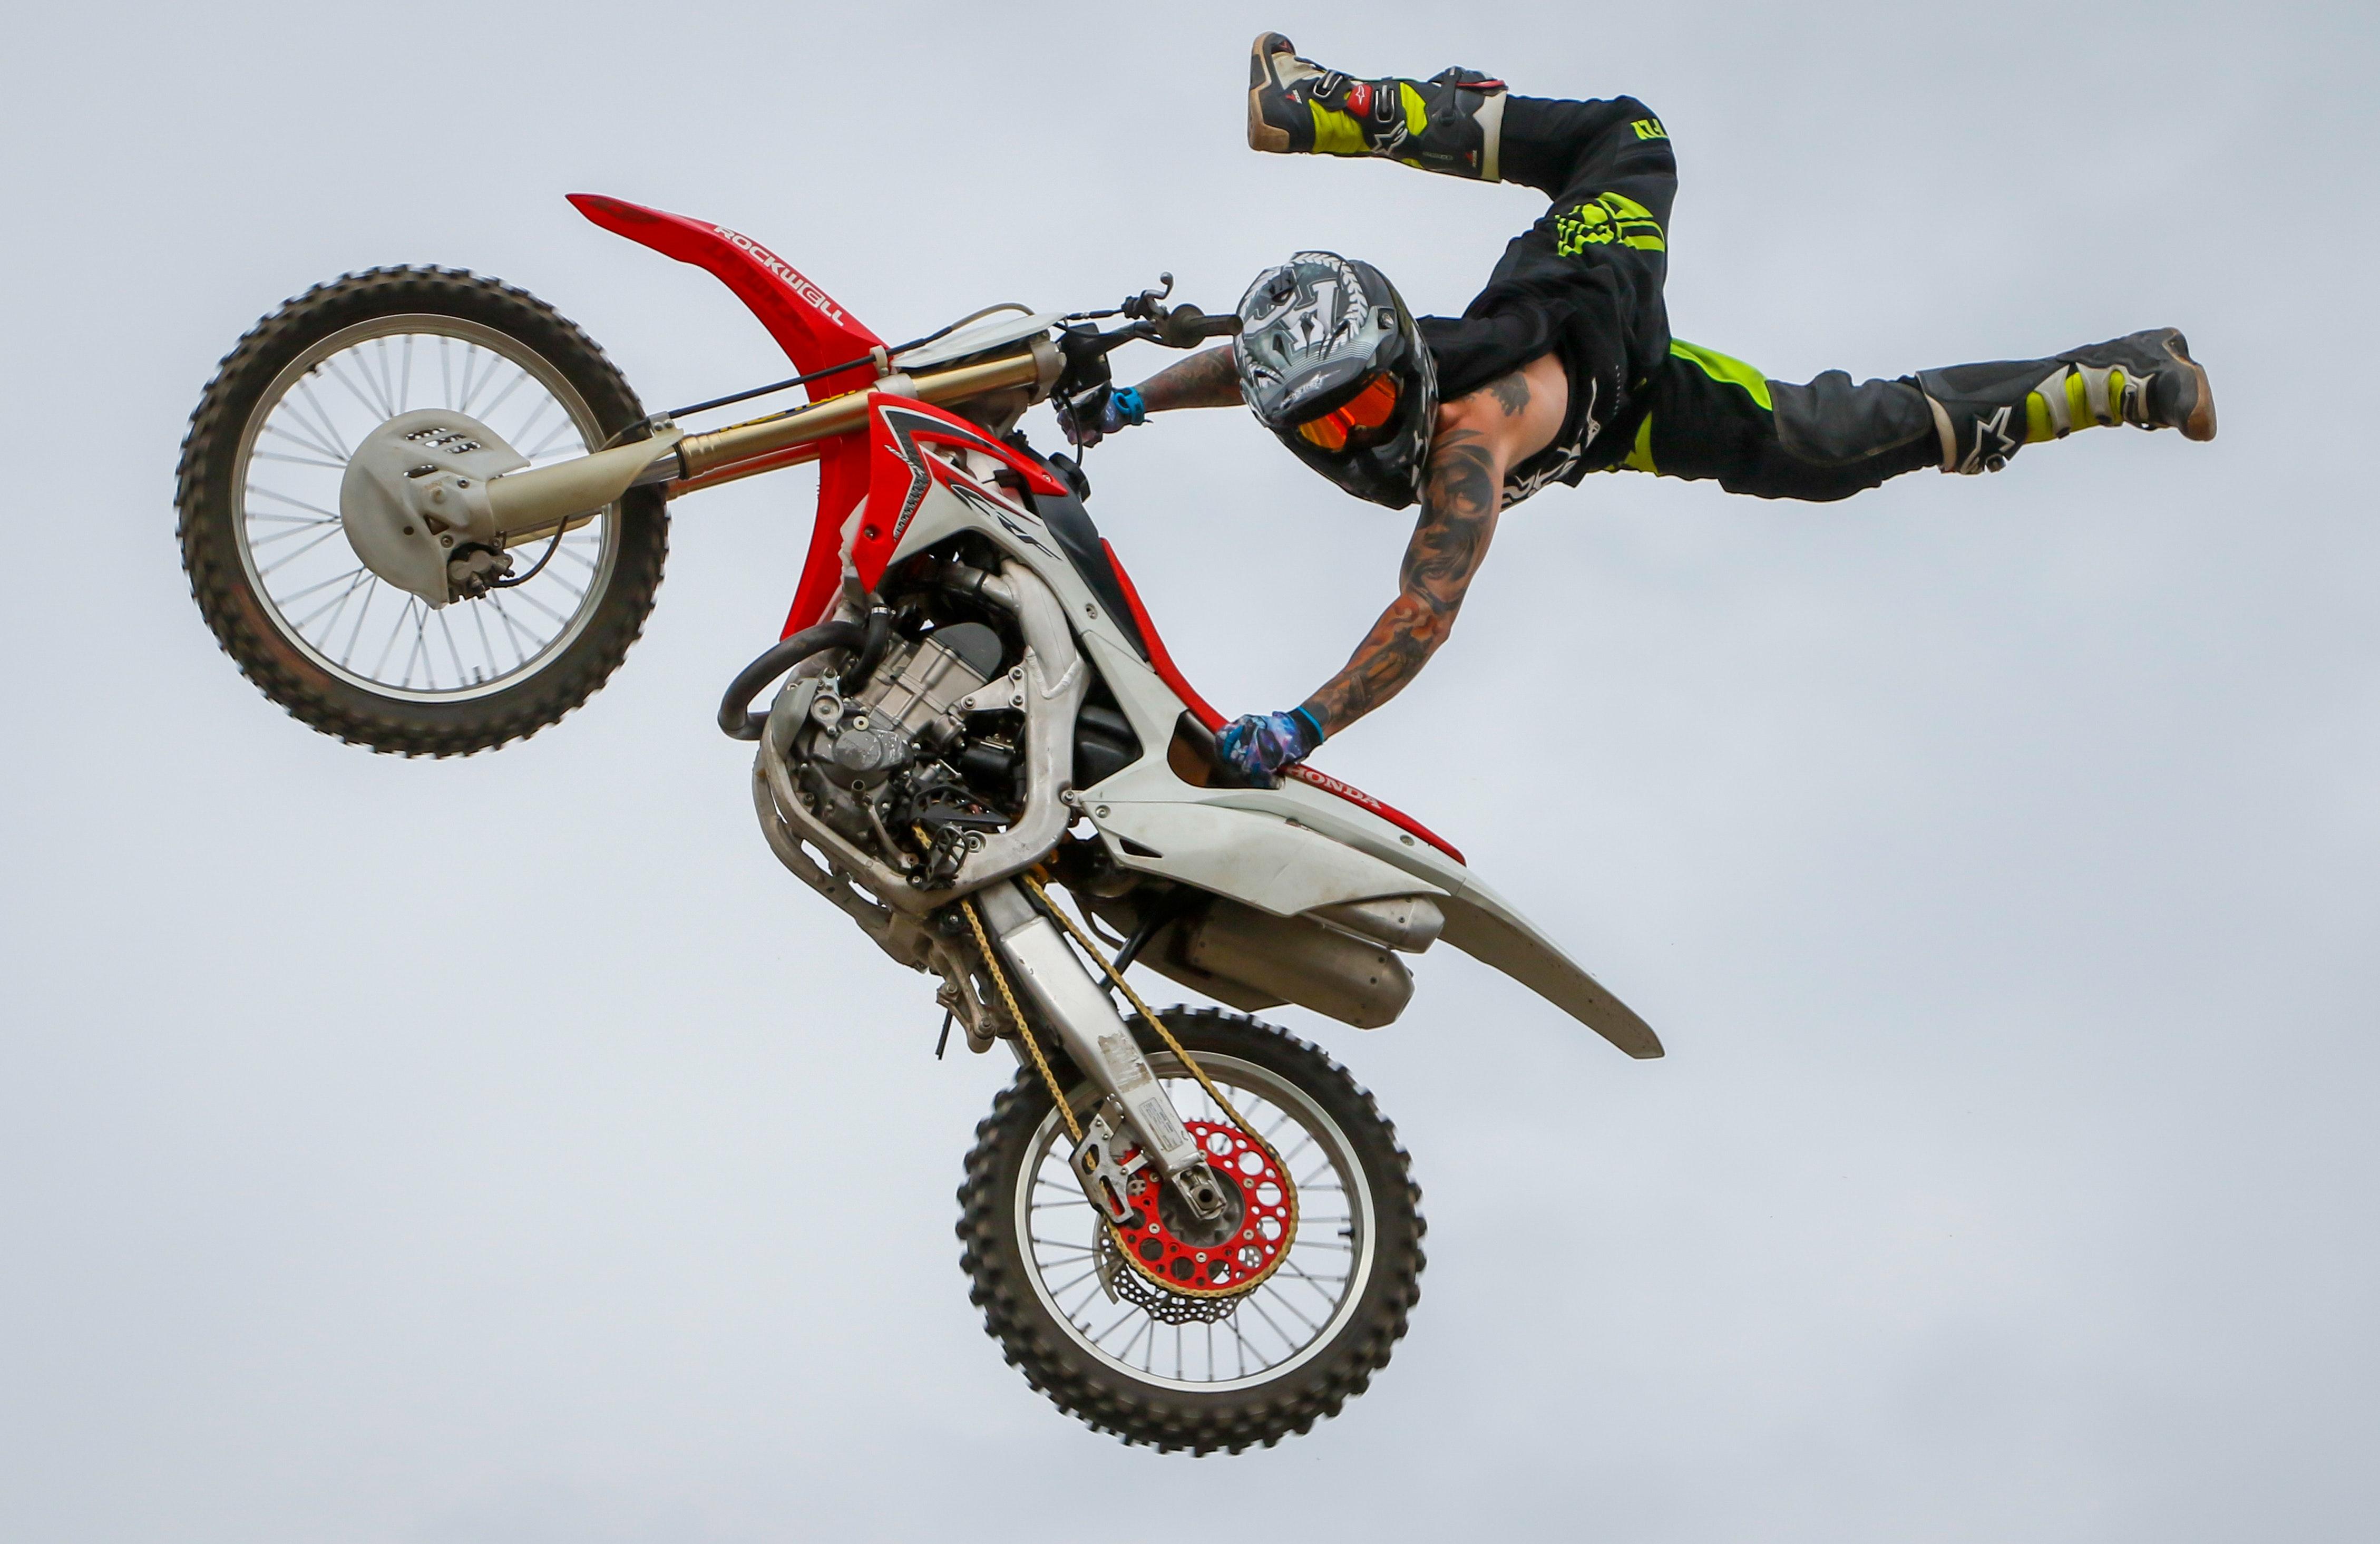 Cara Pegang Setang Dan Teknik Melompat Pada Motocross